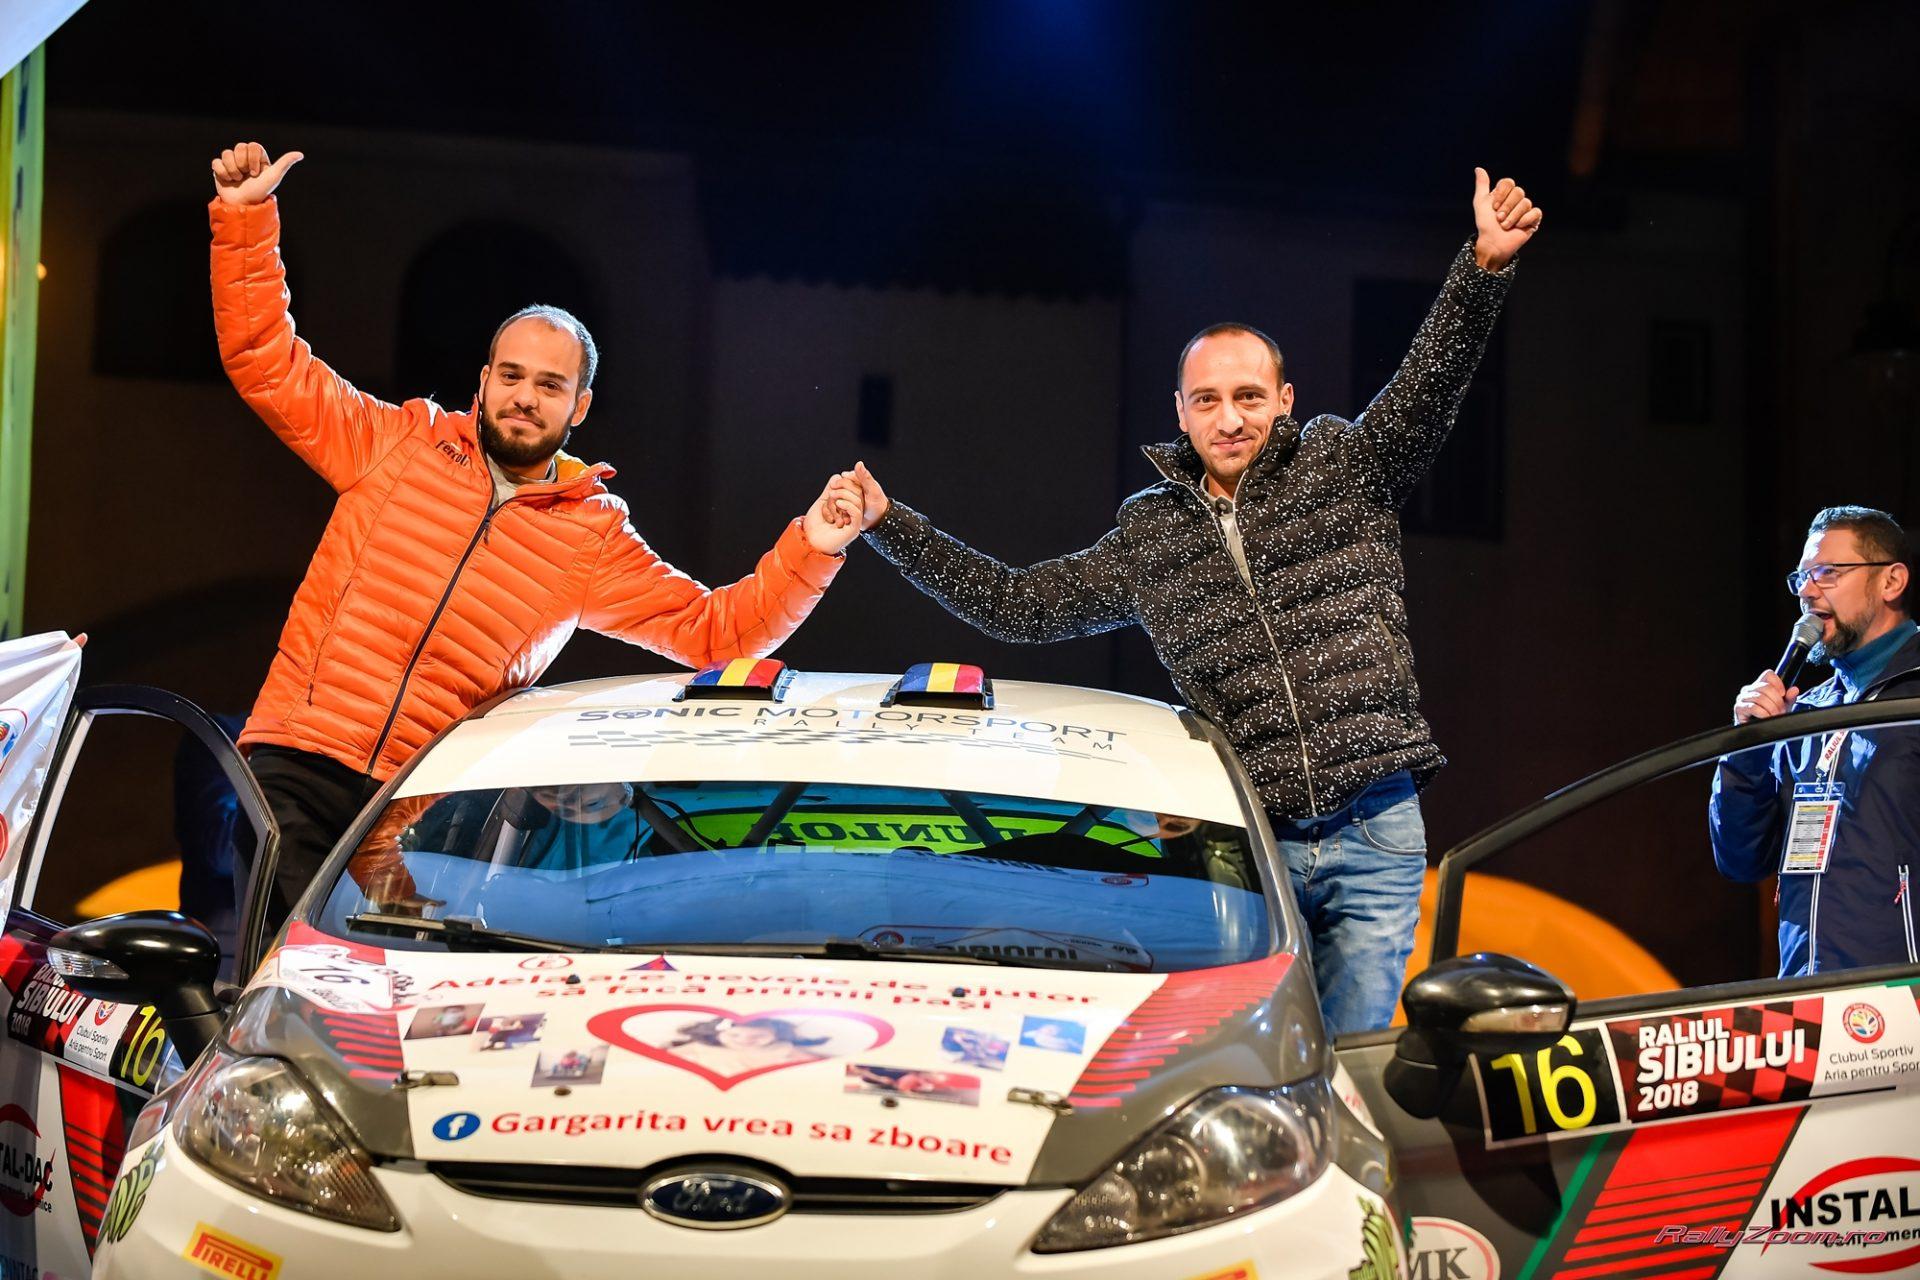 Sezonul 2019 de raliuri debuteaza pe Transfagarasan pentru Csongor Szabo